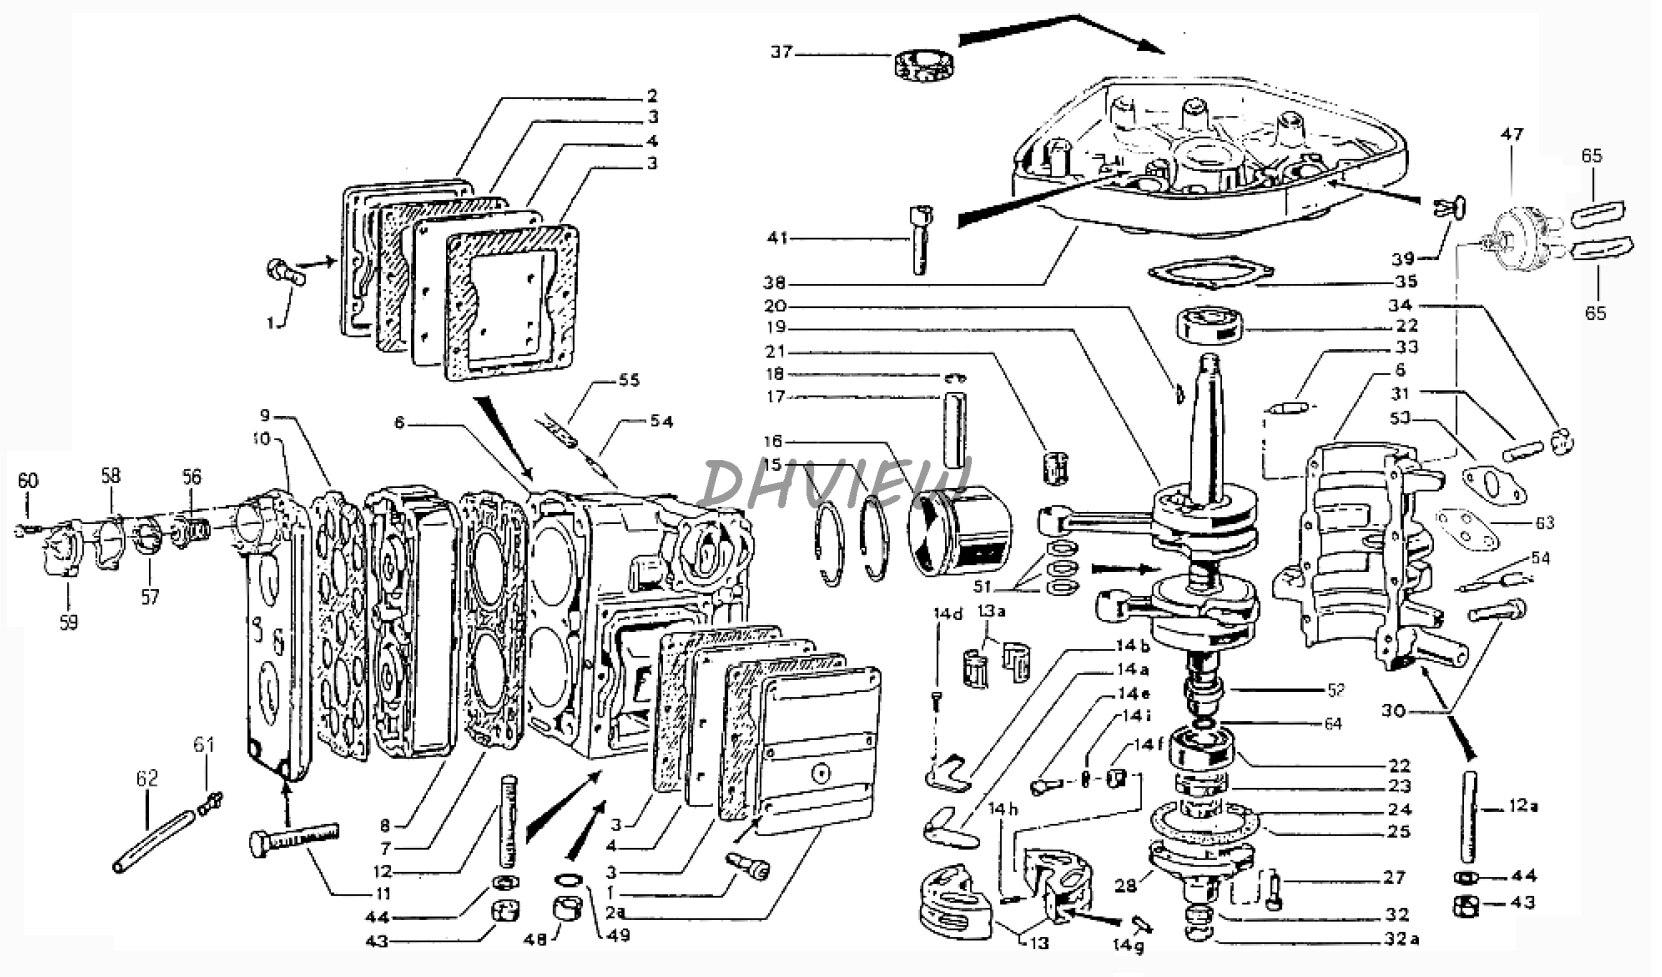 Jetunit 100premium Jetski Stator Assembly Magneto Generator Kawasaki 1100 Stx Jet Ski Wiring Diagram Free Shipping Parts For Zongshen Selva 2 Stroke 99hp 15hp Outboard Motor